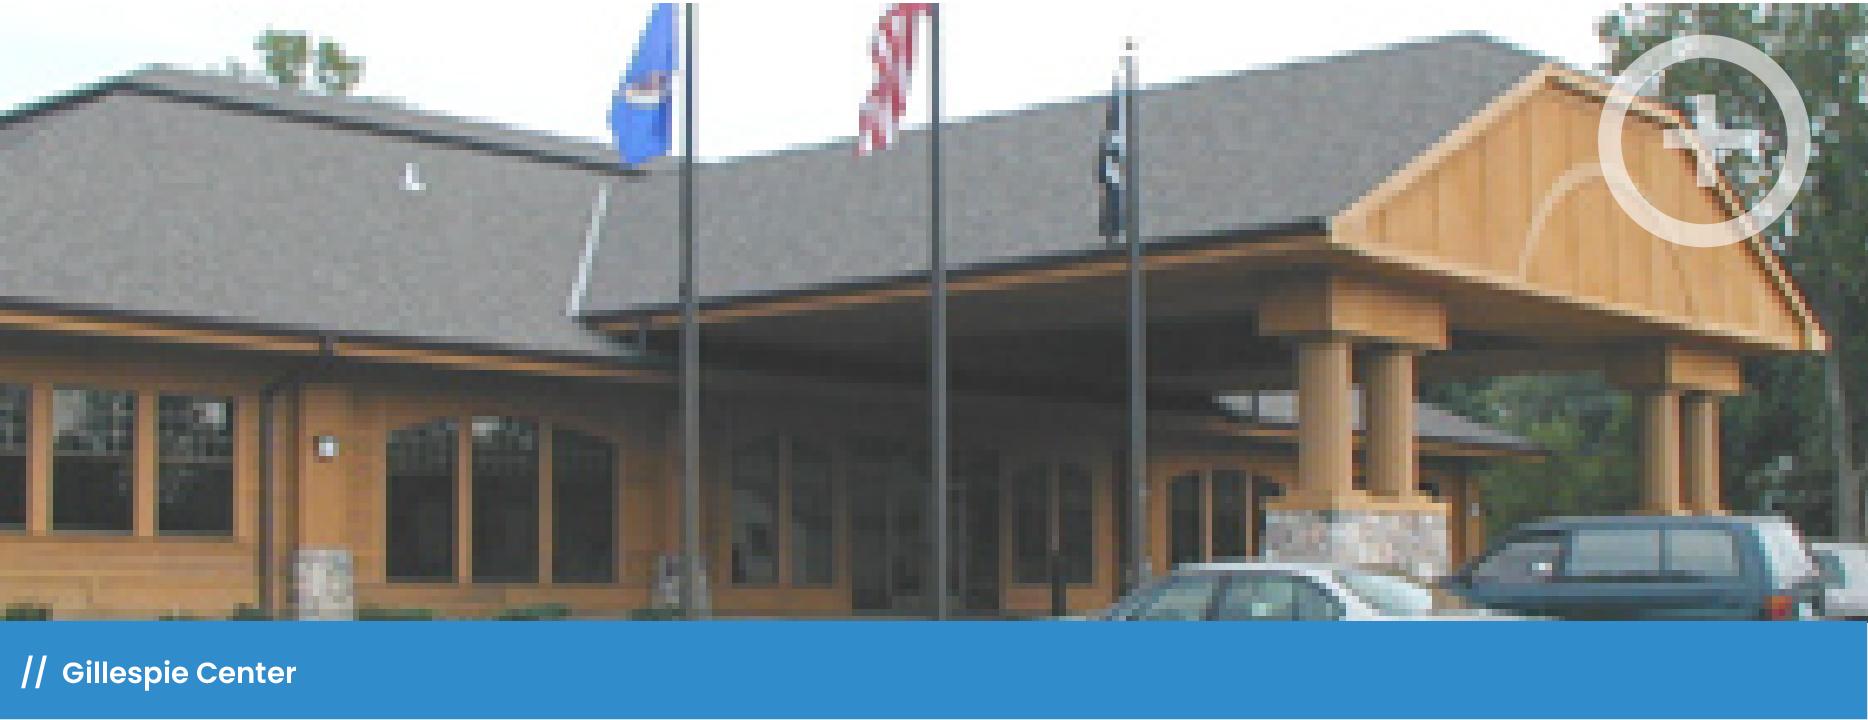 Yanik-Watermark_Gillespie Center-